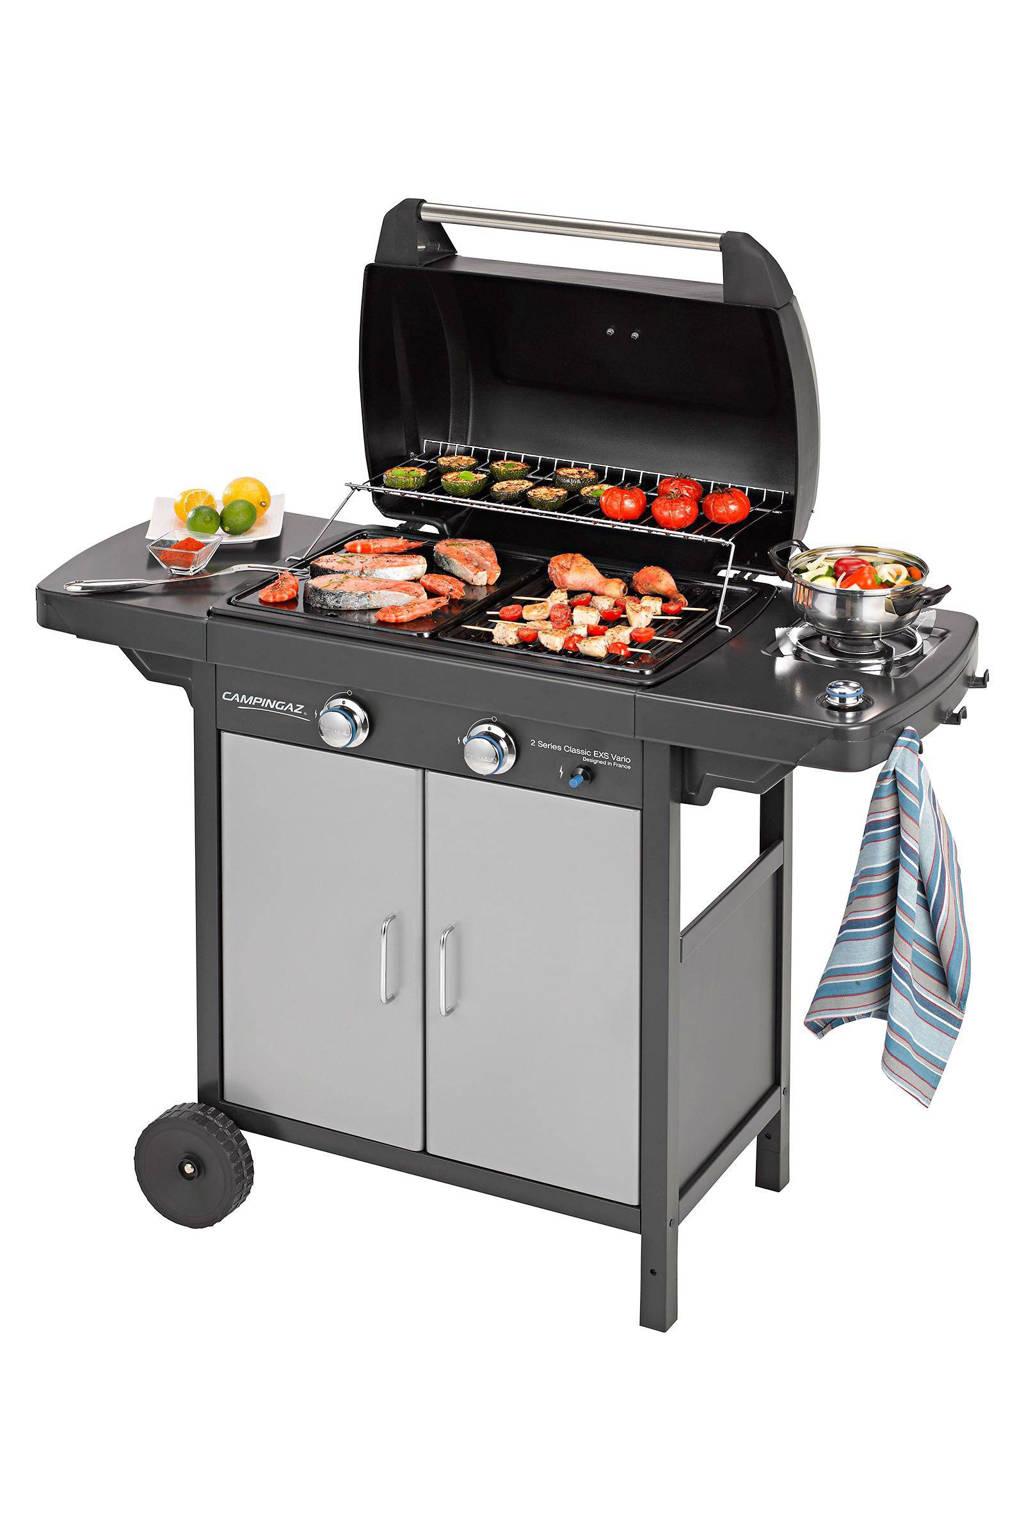 Campingaz 2 series Classic EXS Vario gasbarbecue, Grijs